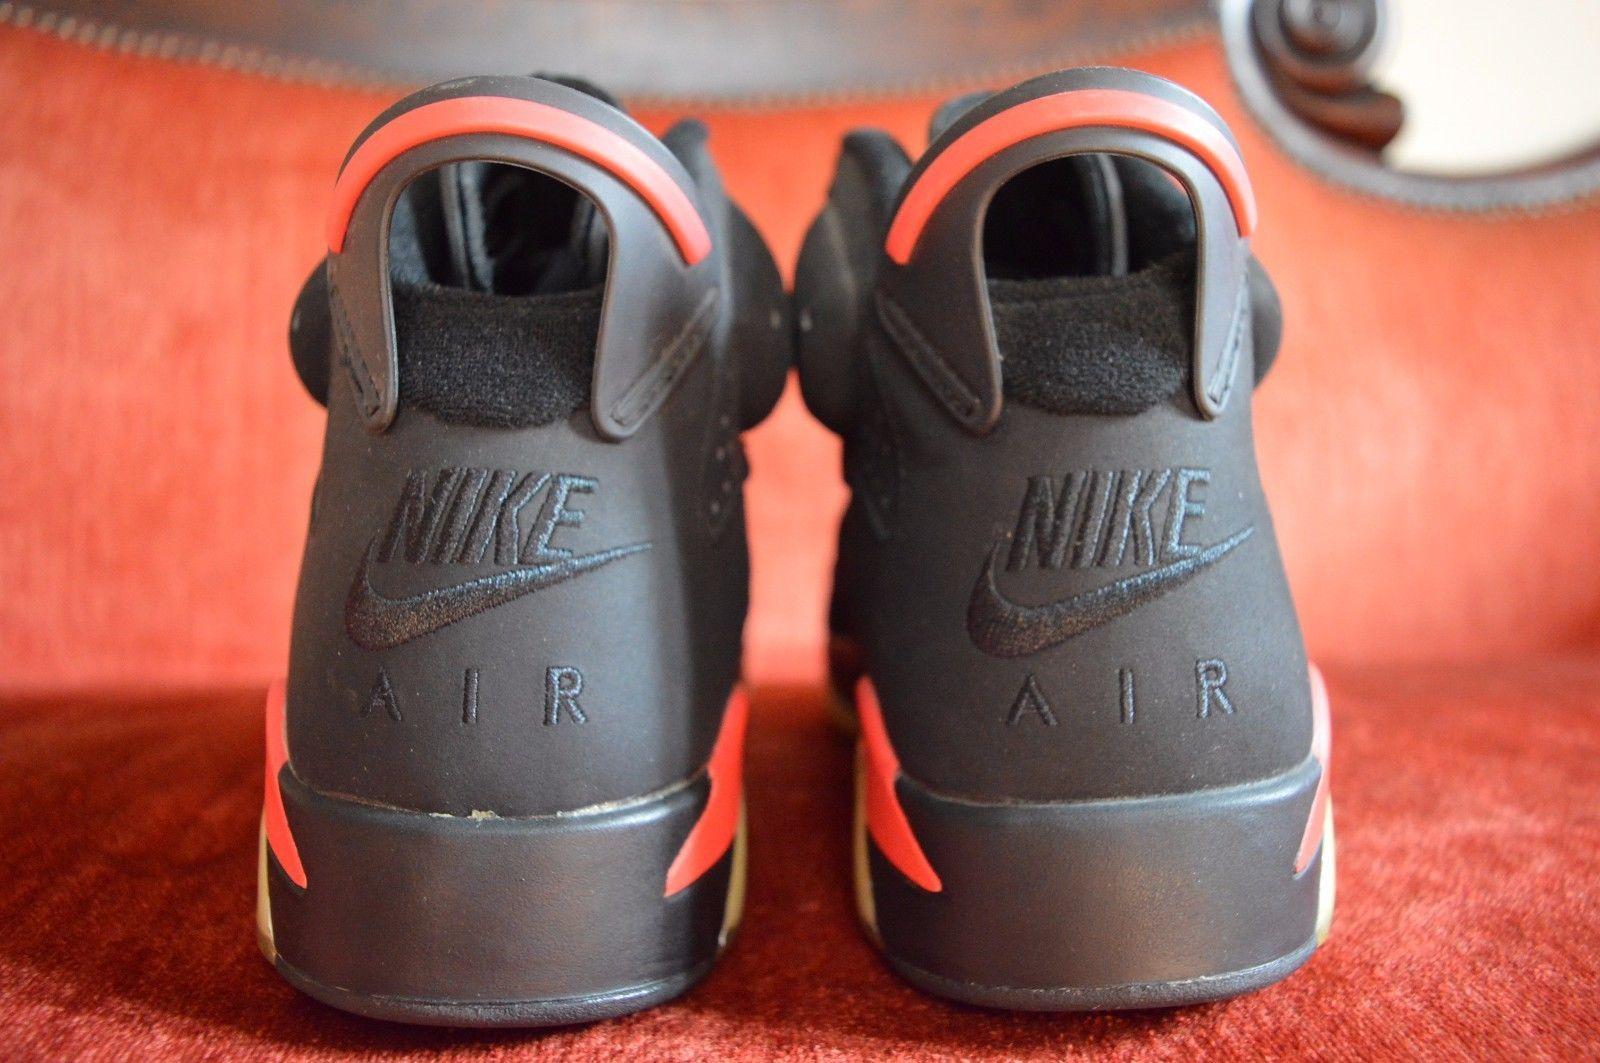 0b867cb940aa 2000 Nike Air Jordan VI 6 Retro BLACK DEEP INFRARED RED BRED 136038-061 Size  9.5